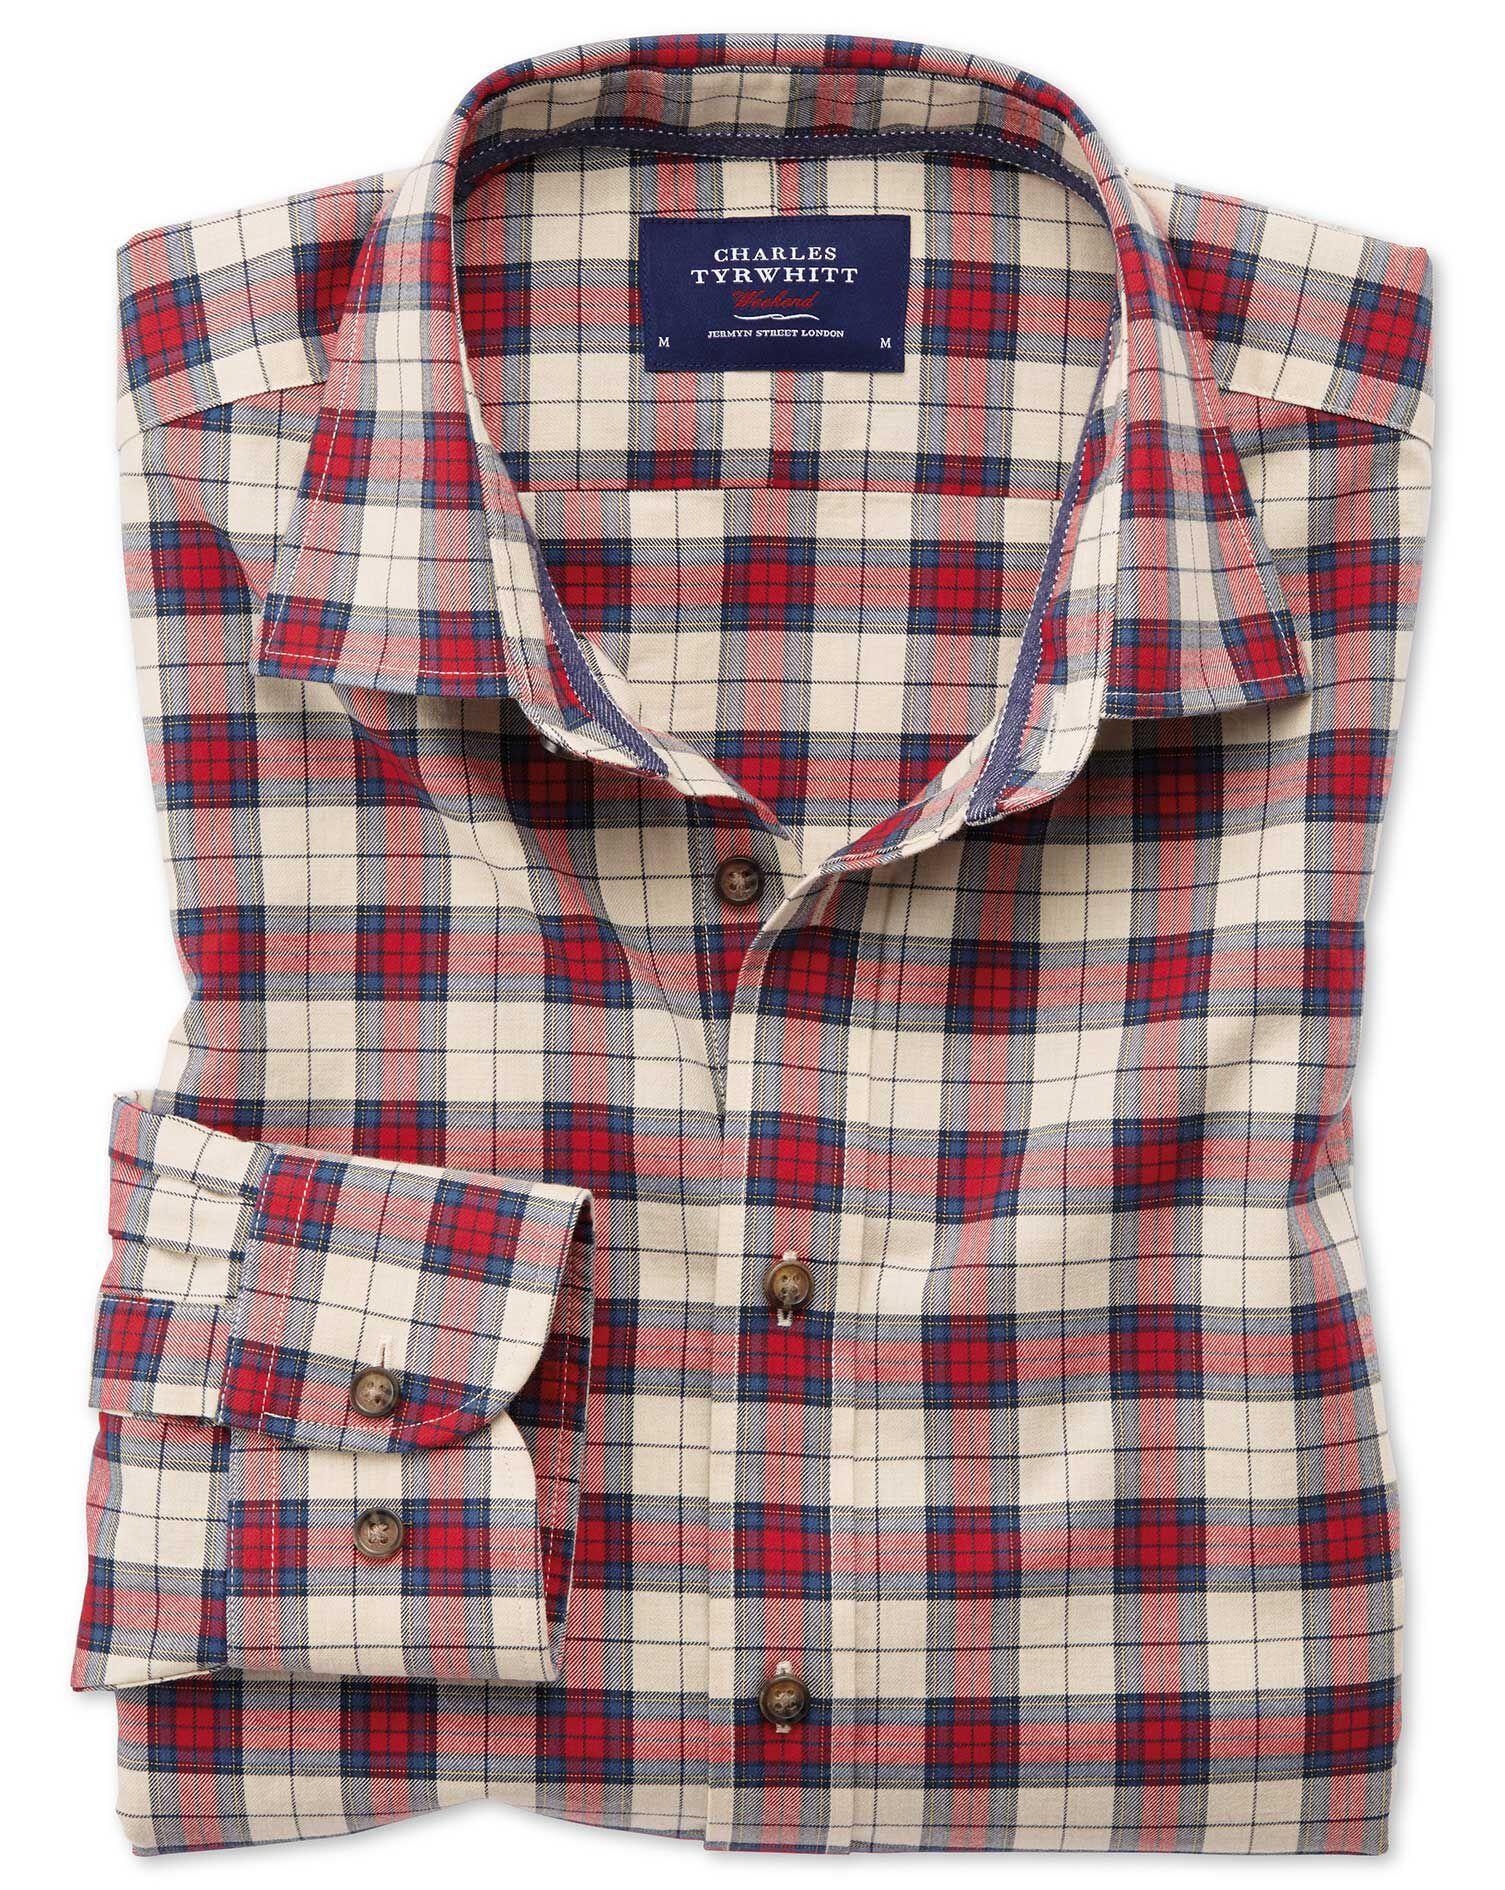 Slim Fit Heather Tartan Red Check Cotton Shirt Single Cuff Size Large by Charles Tyrwhitt